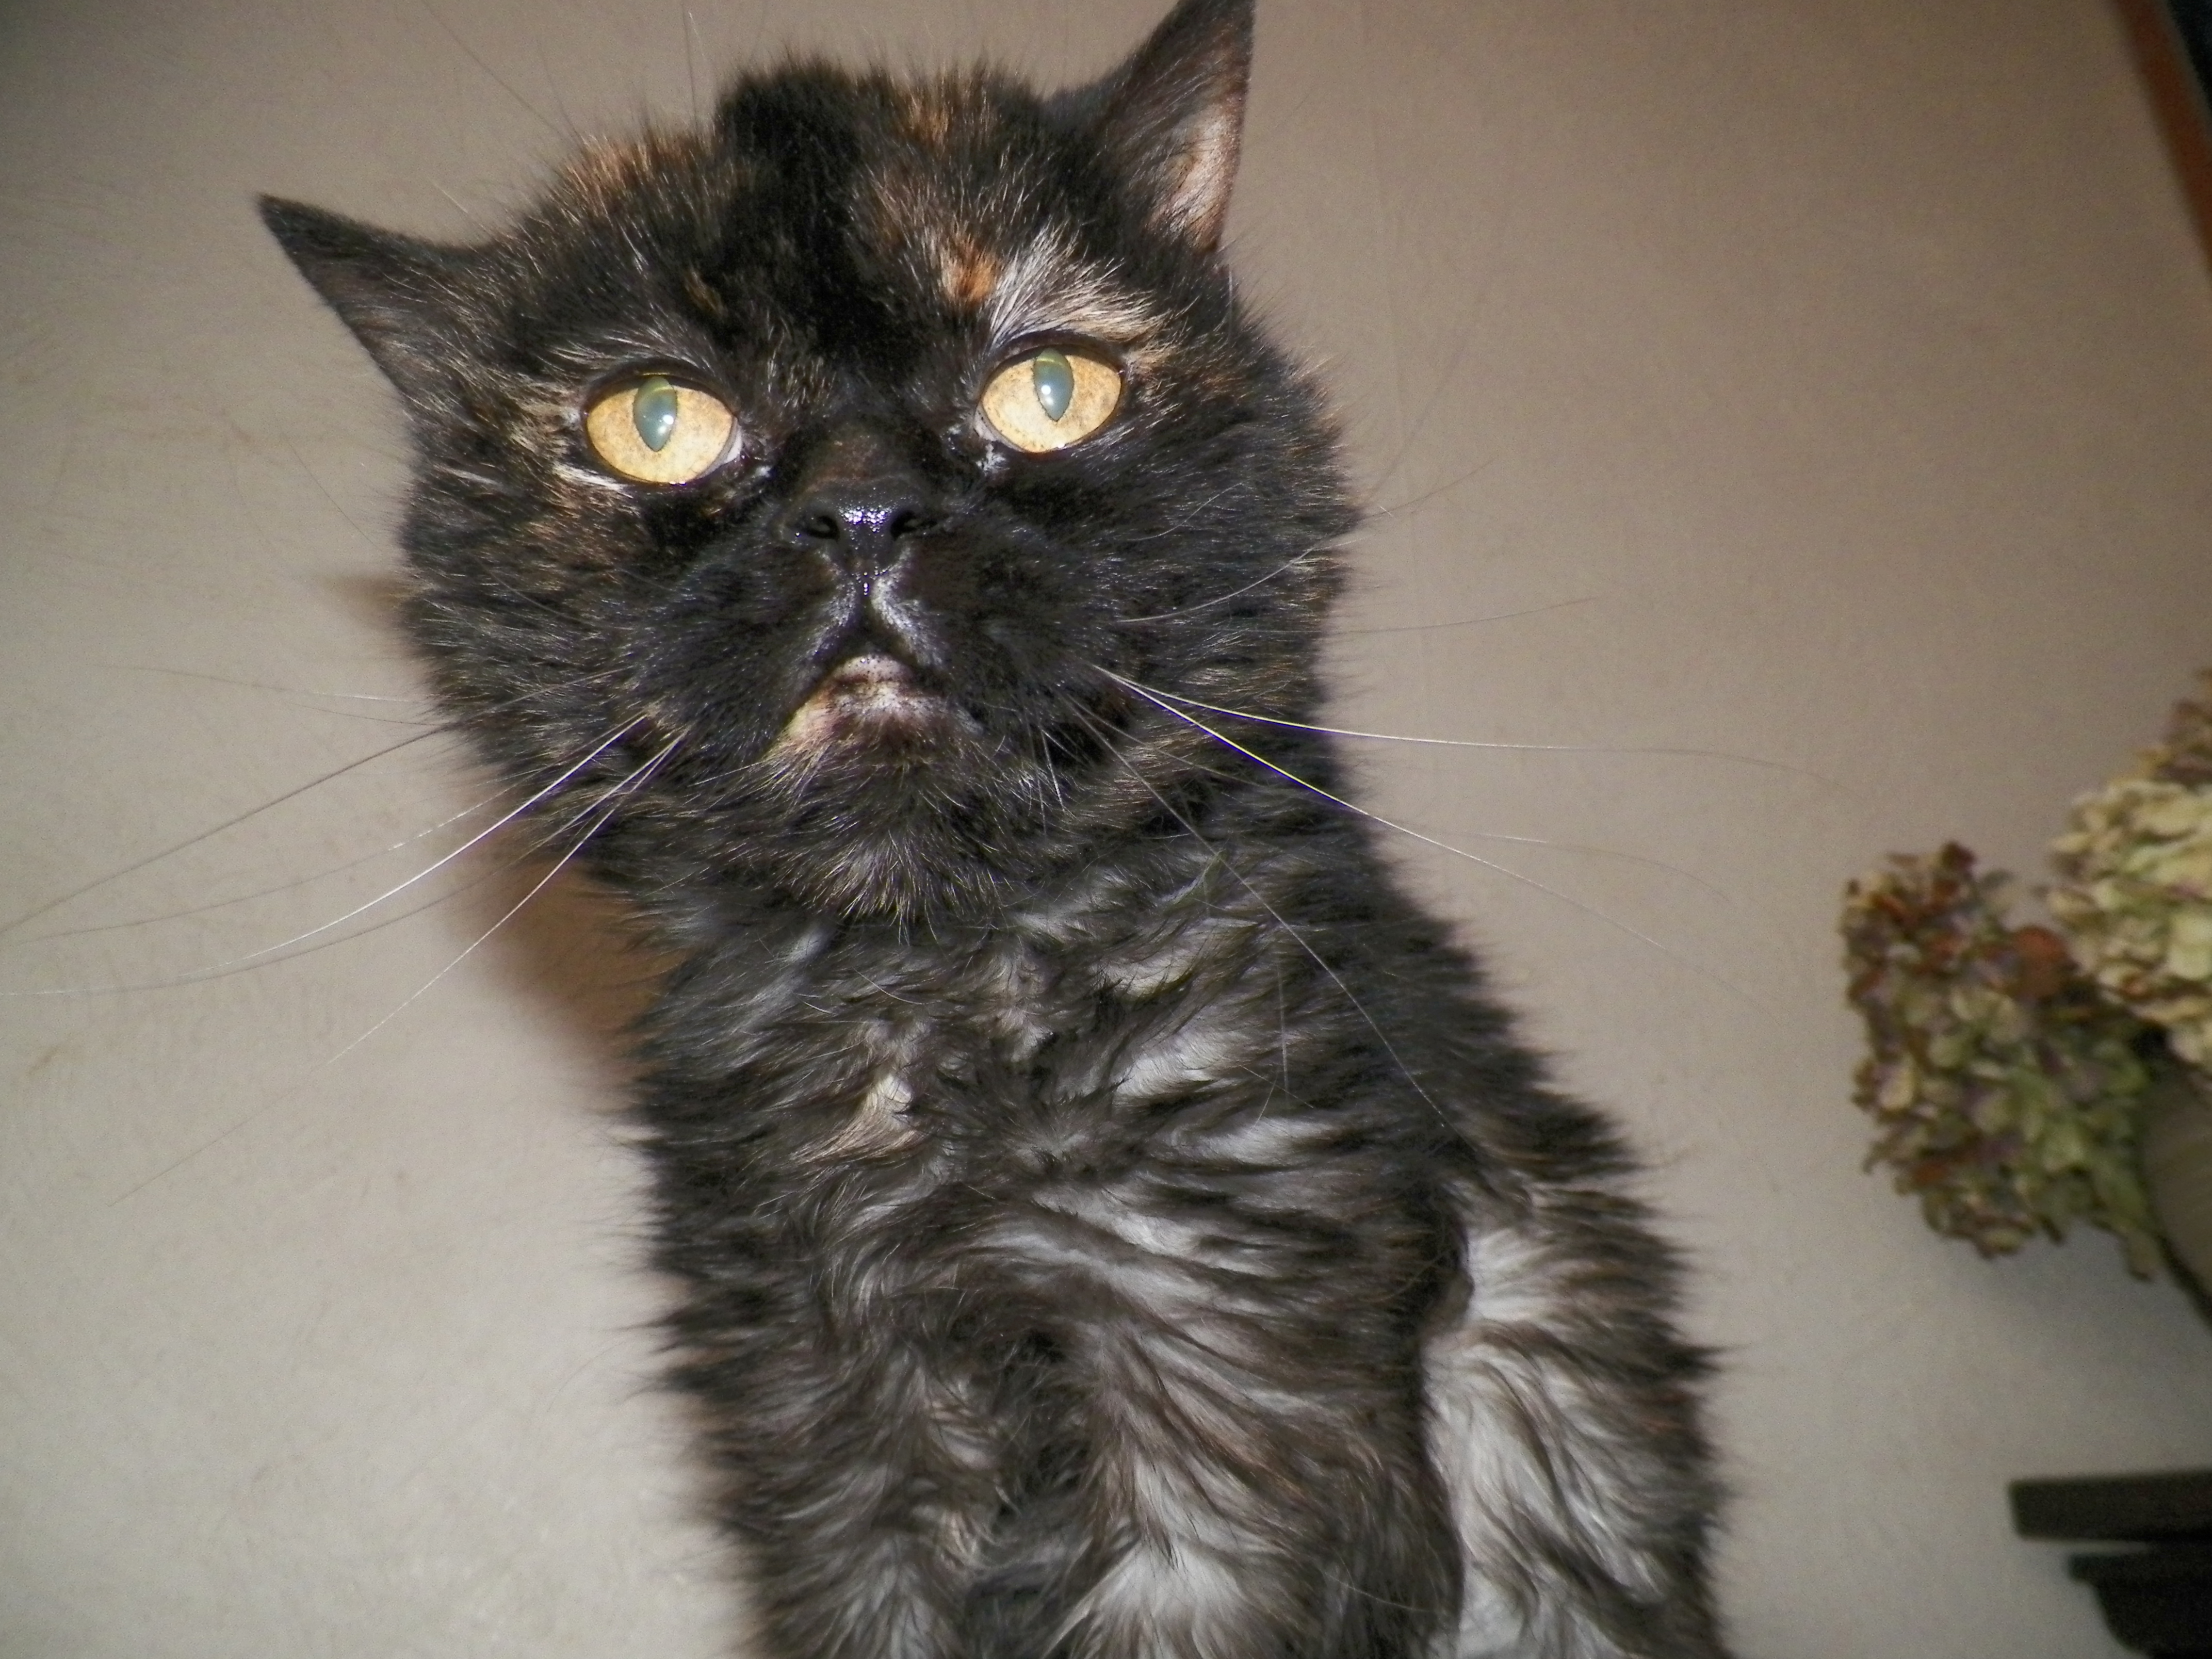 Weird Cat, Black, Cat, Eyes, Orange, HQ Photo